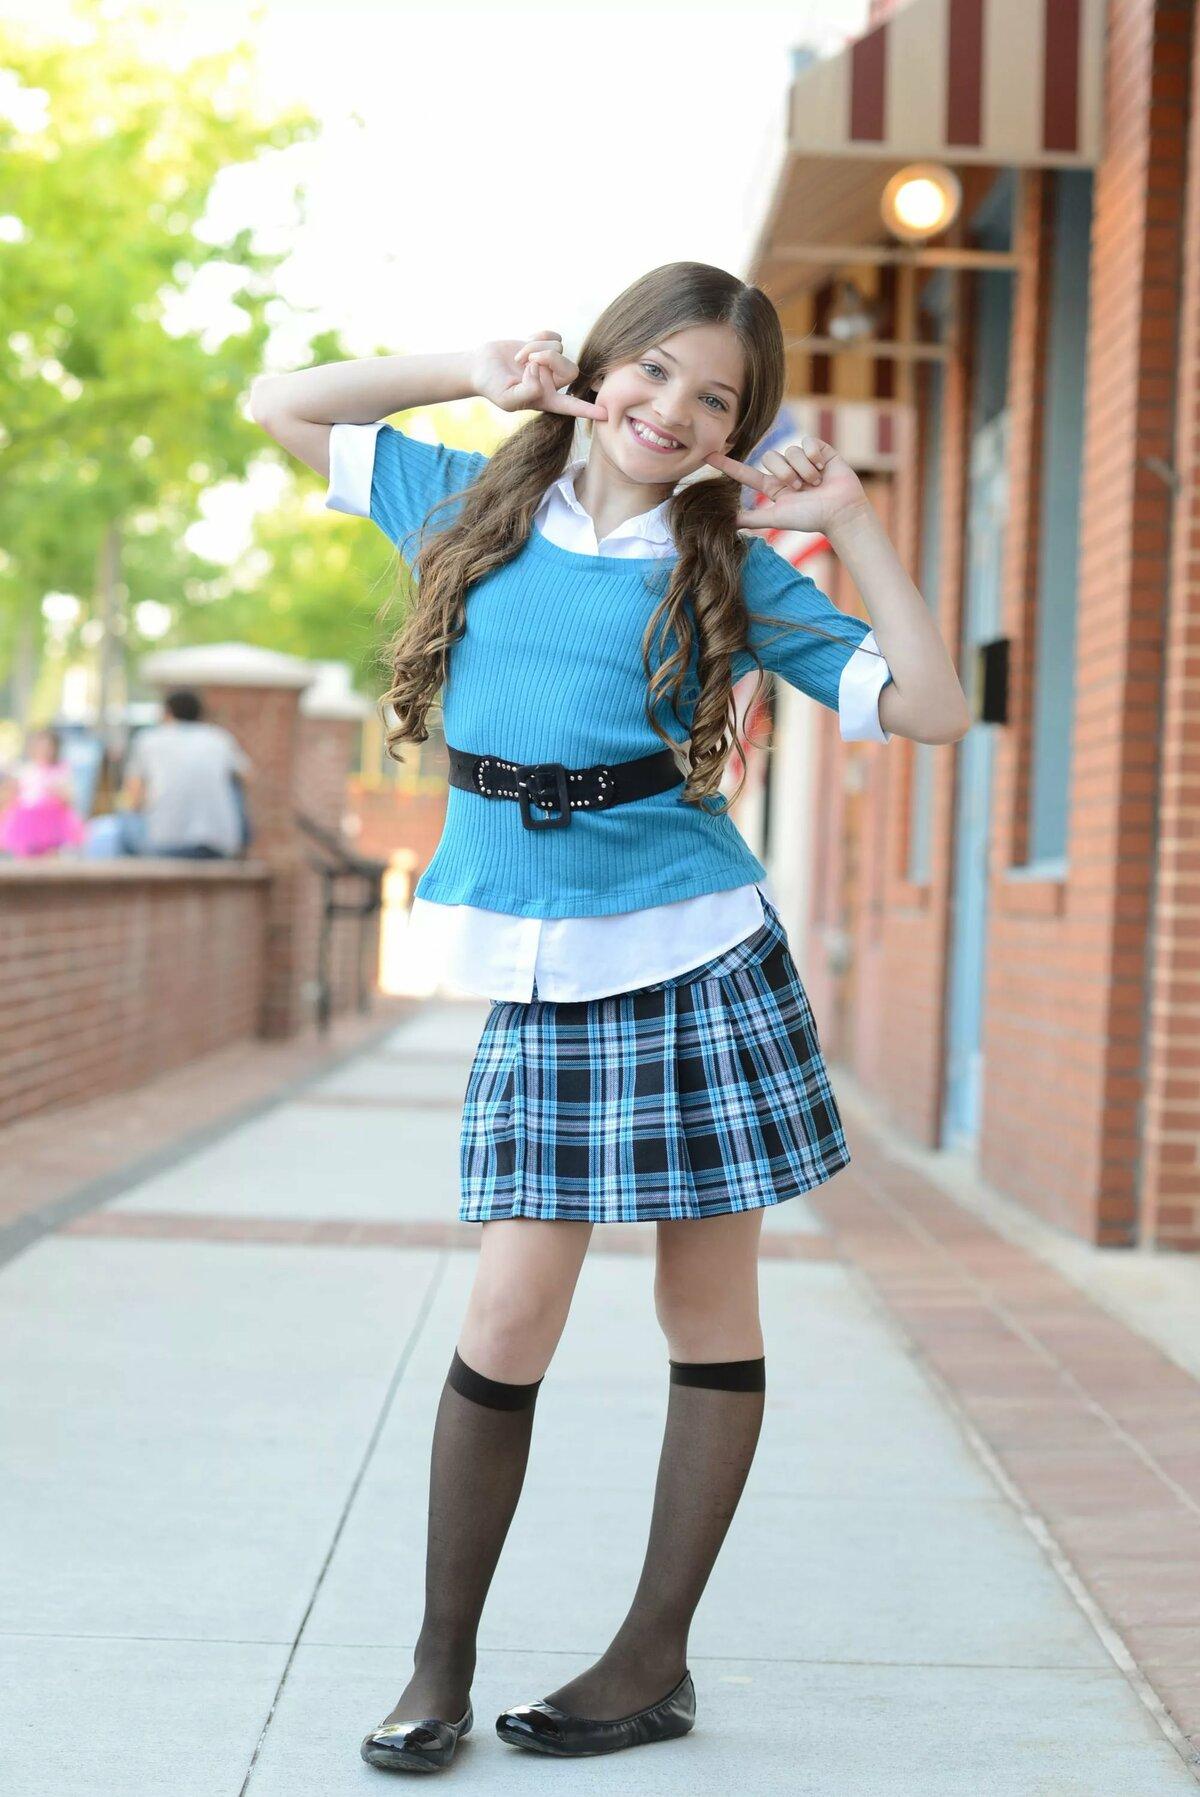 Mile school girl pics — img 4